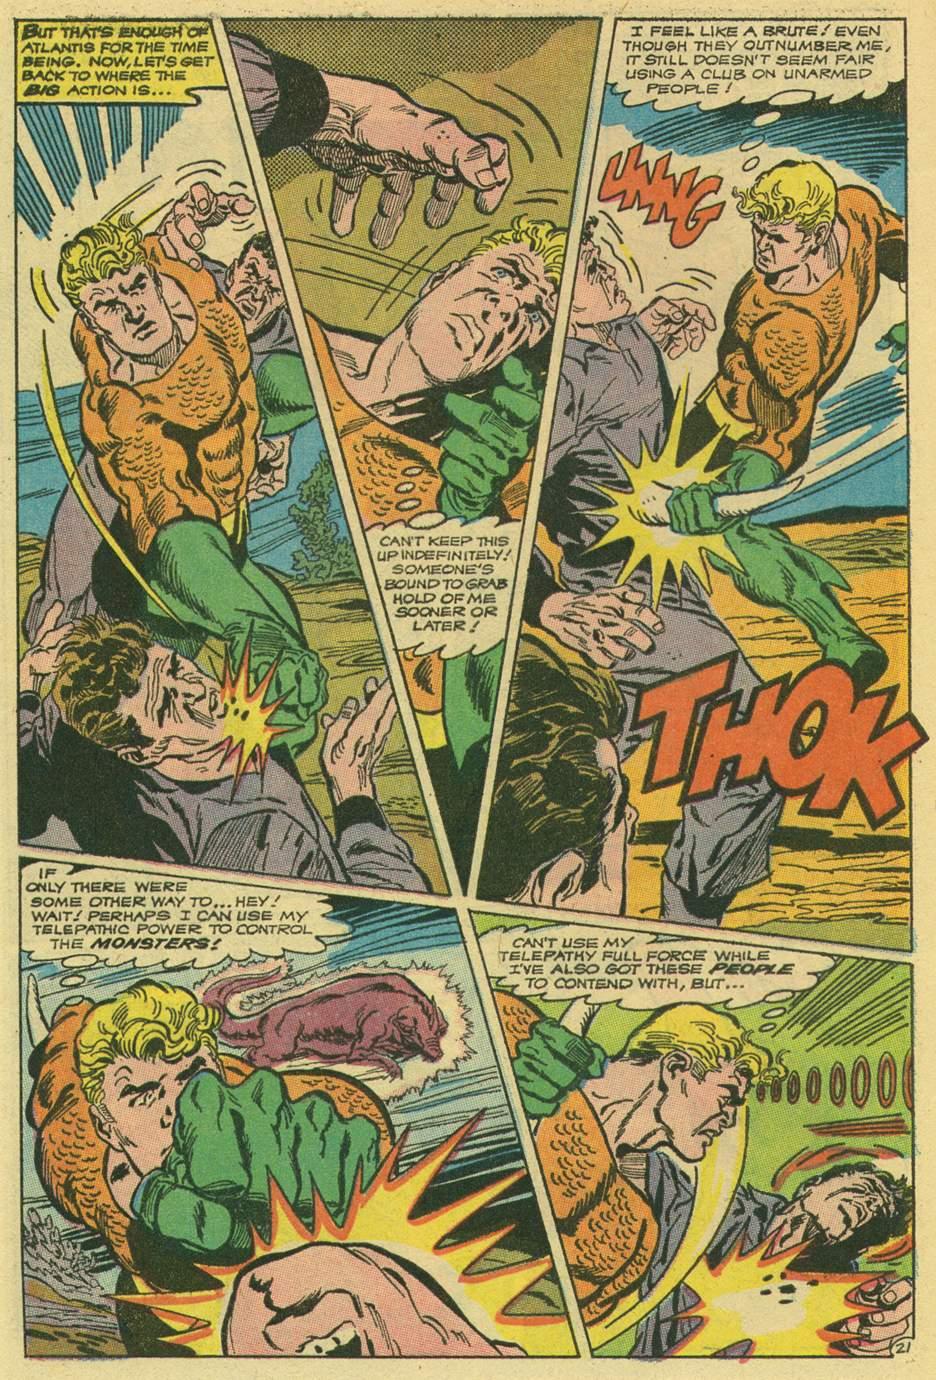 Aquamam #41 by Steve Skeates, Jim Aparo, and Dick Giordano